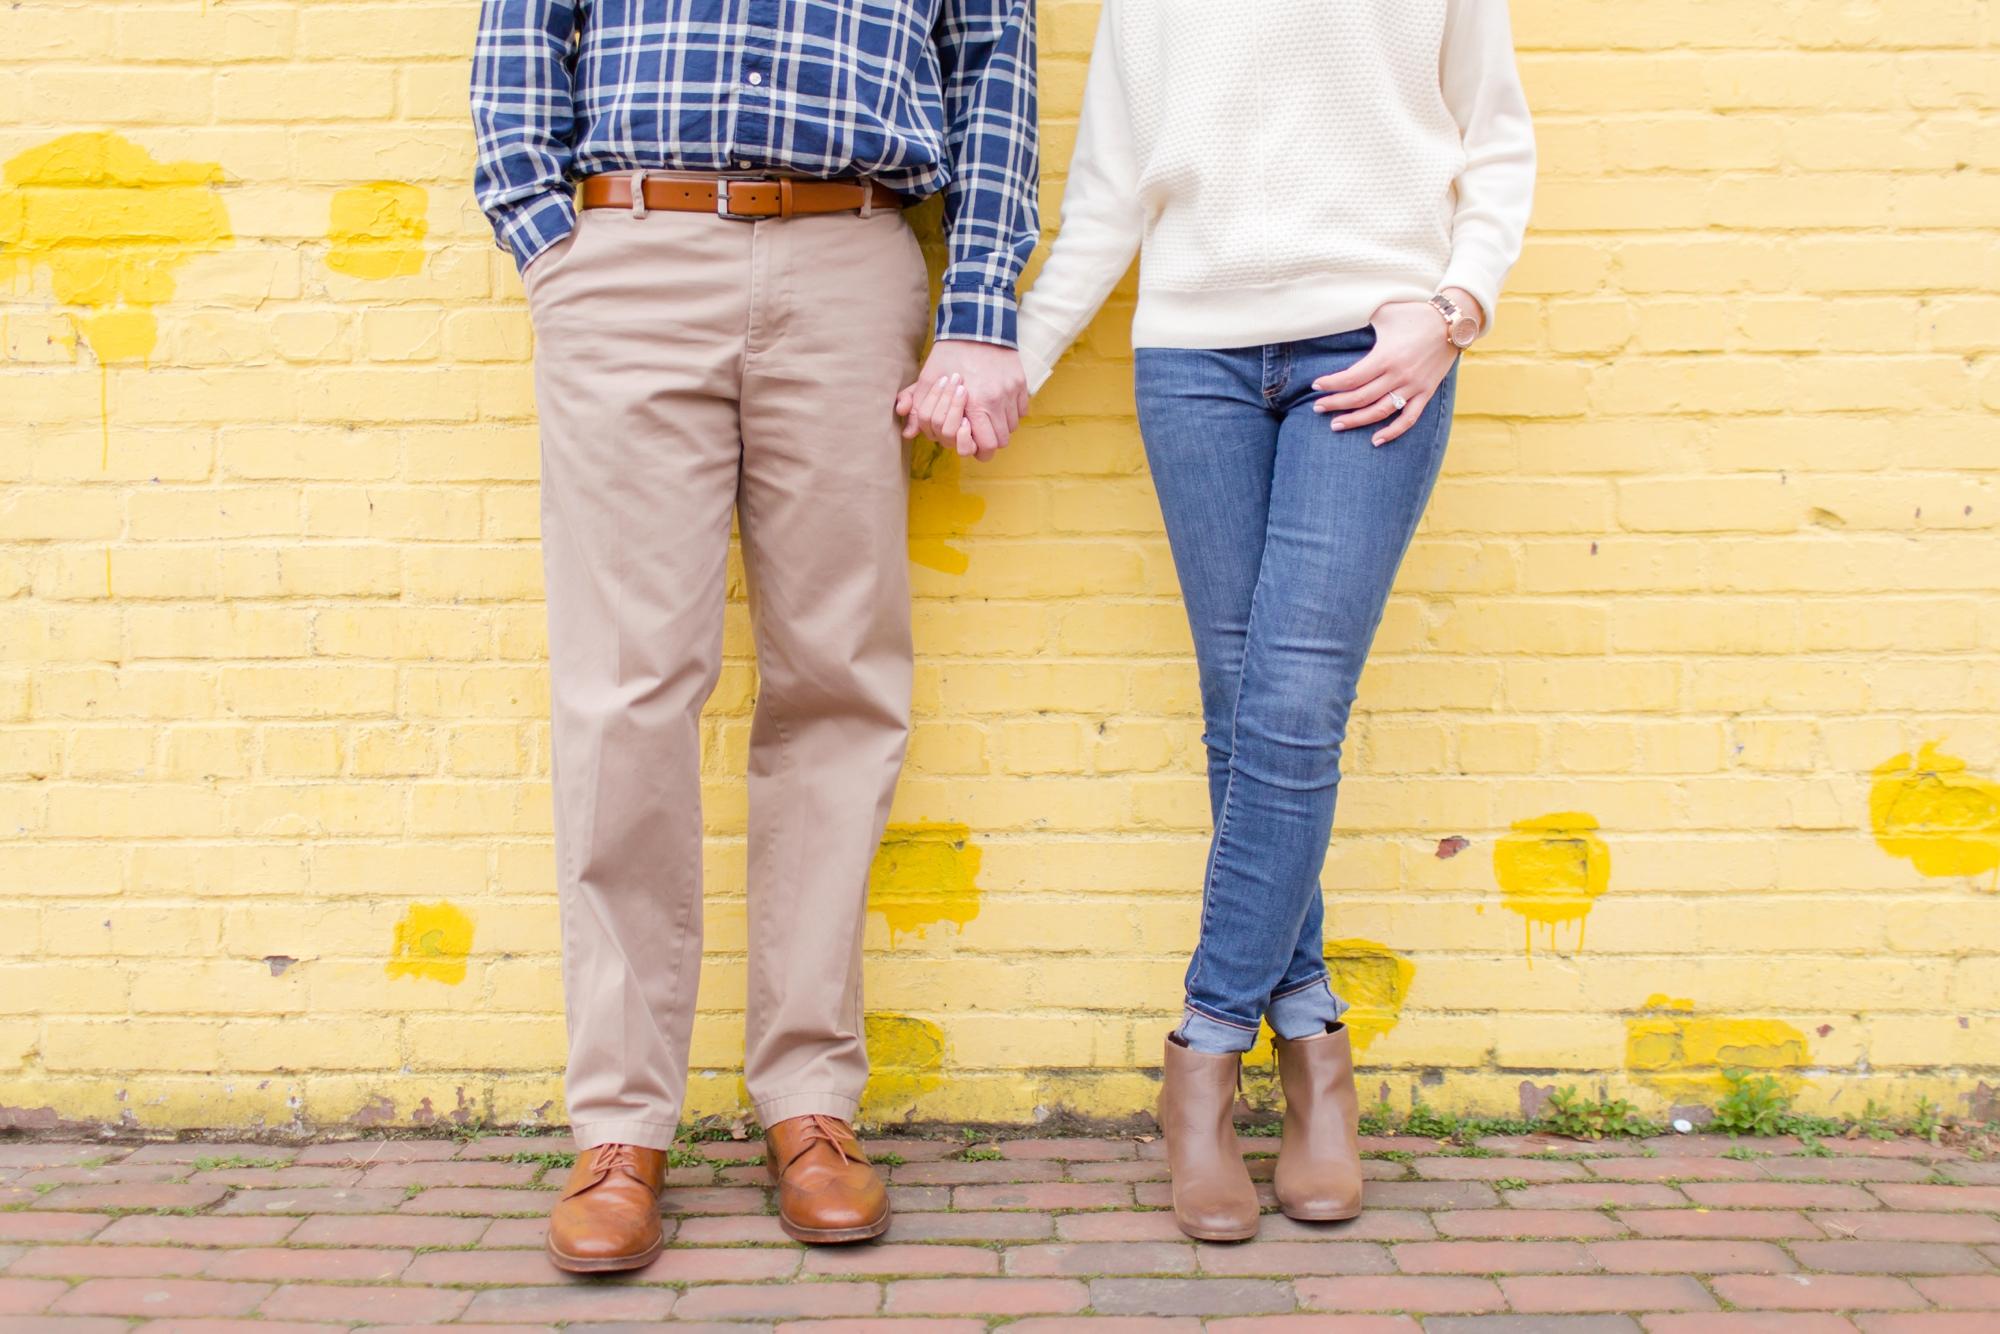 Kristin & Matt Engagement-368_anna grace photography old town alexandria virginia engagement and wedding photographer photo.jpg